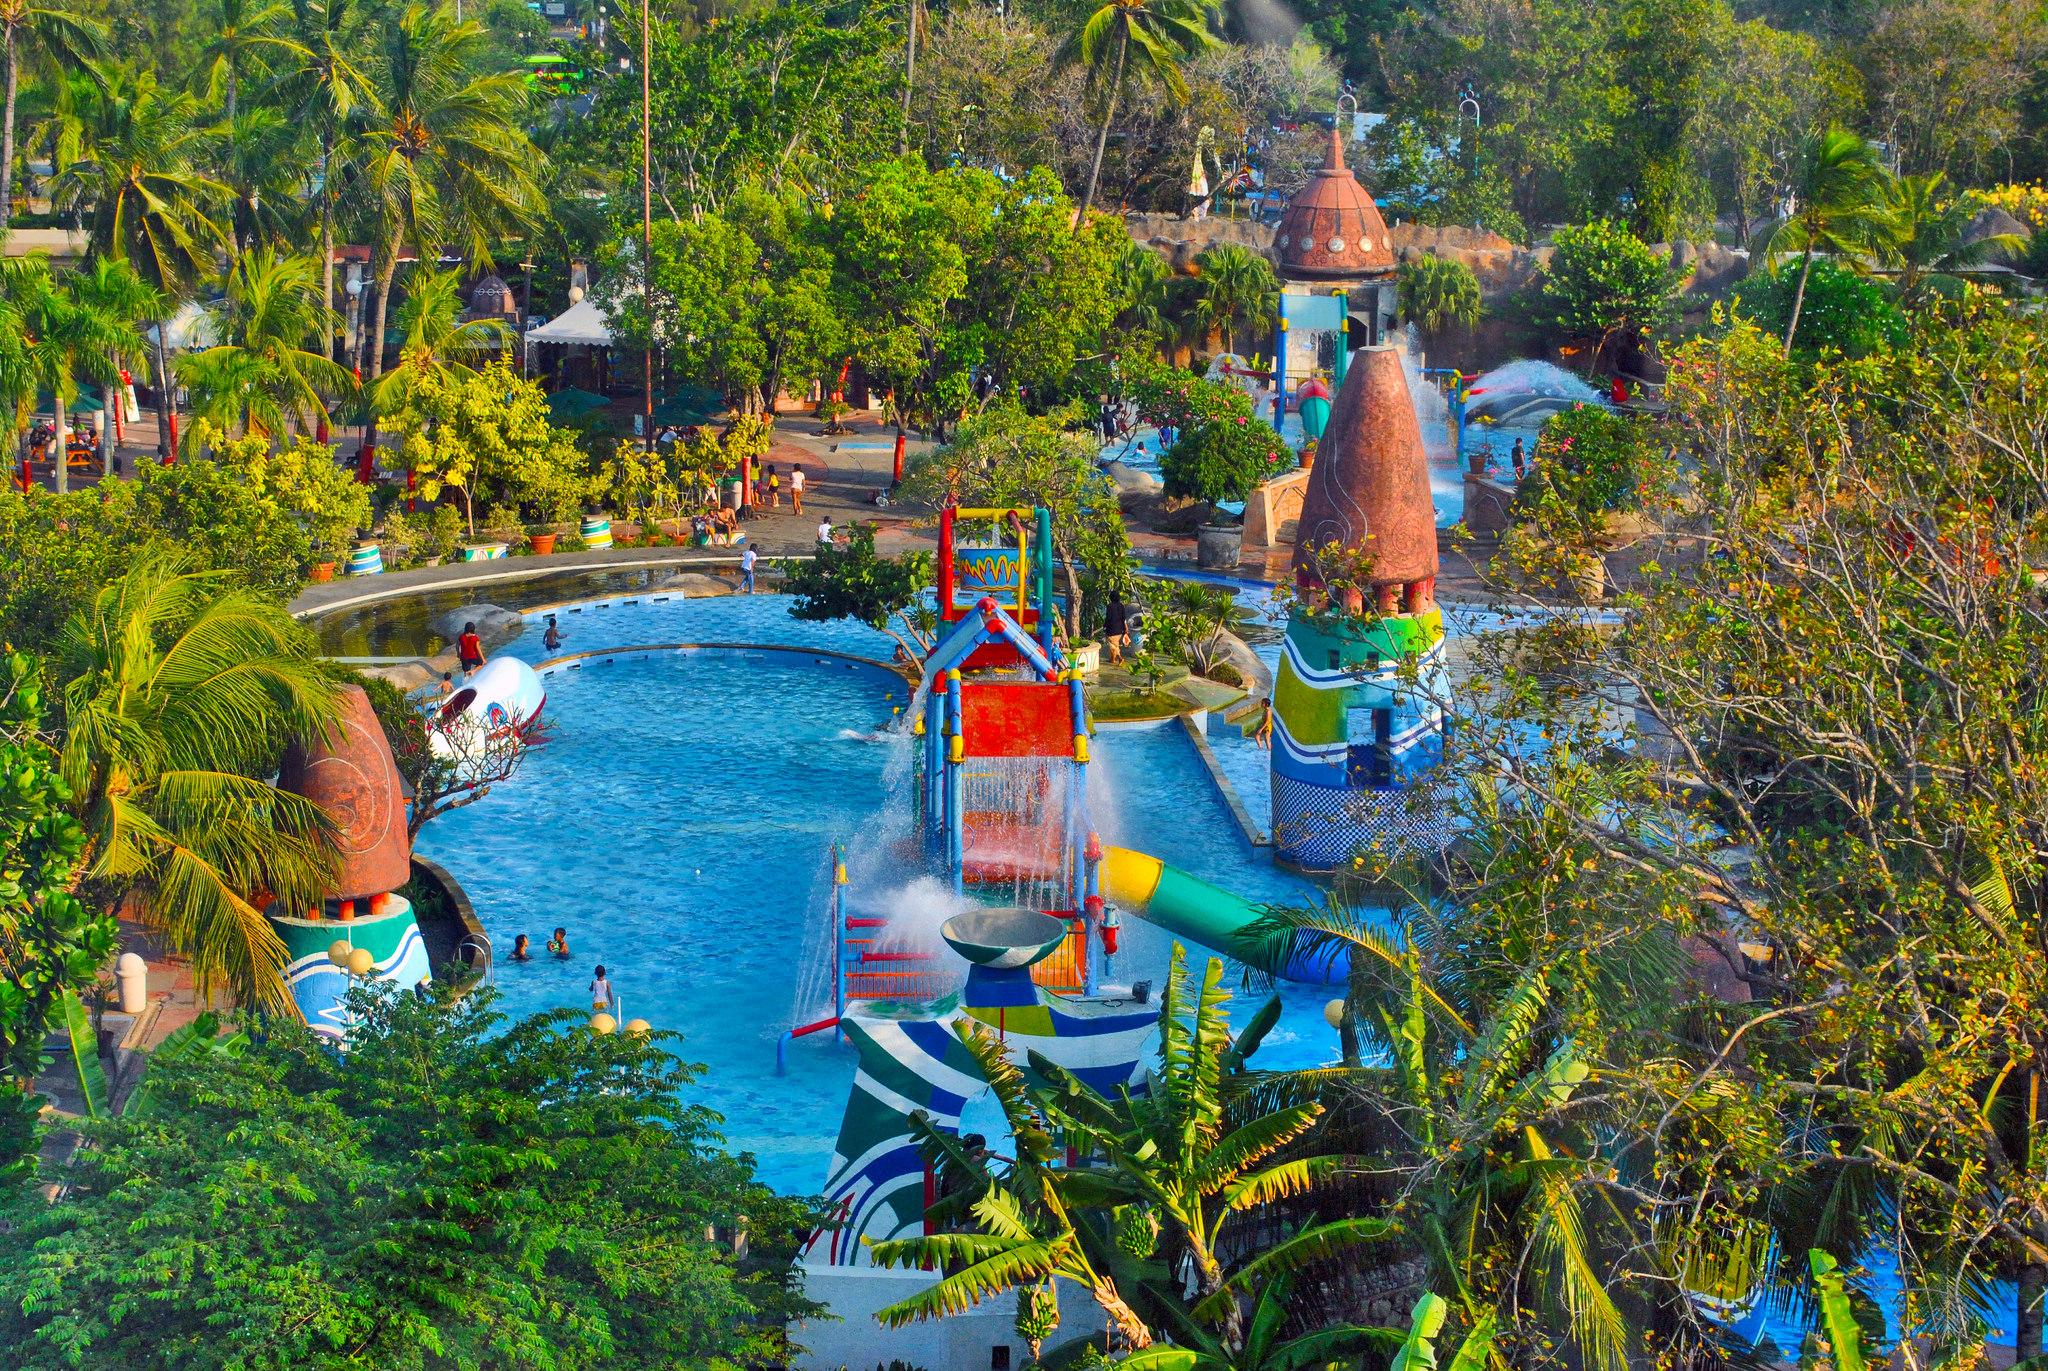 12 Wisata Edukasi Di Jakarta Yang Wajib Di Kunjungi